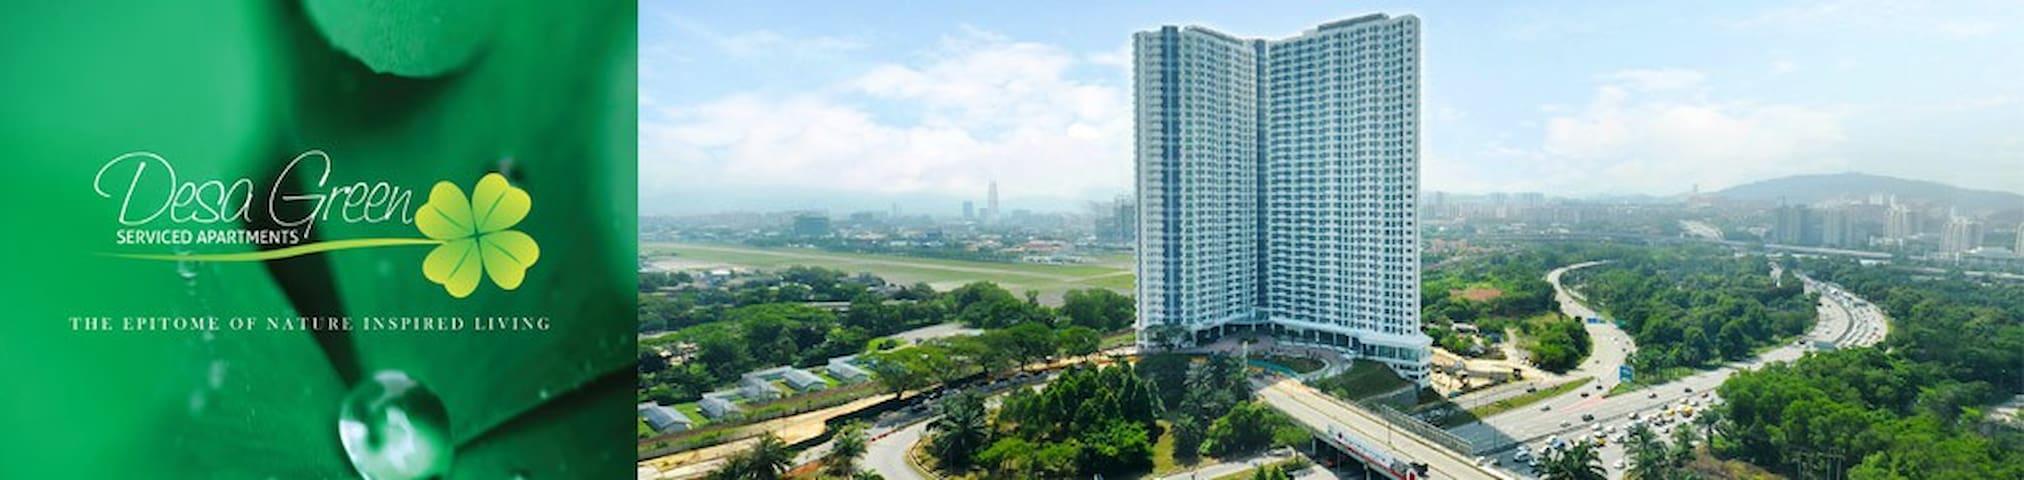 Kuala Lumpur - Desa Green Service Apartment 2Bedr - Kuala Lumpur